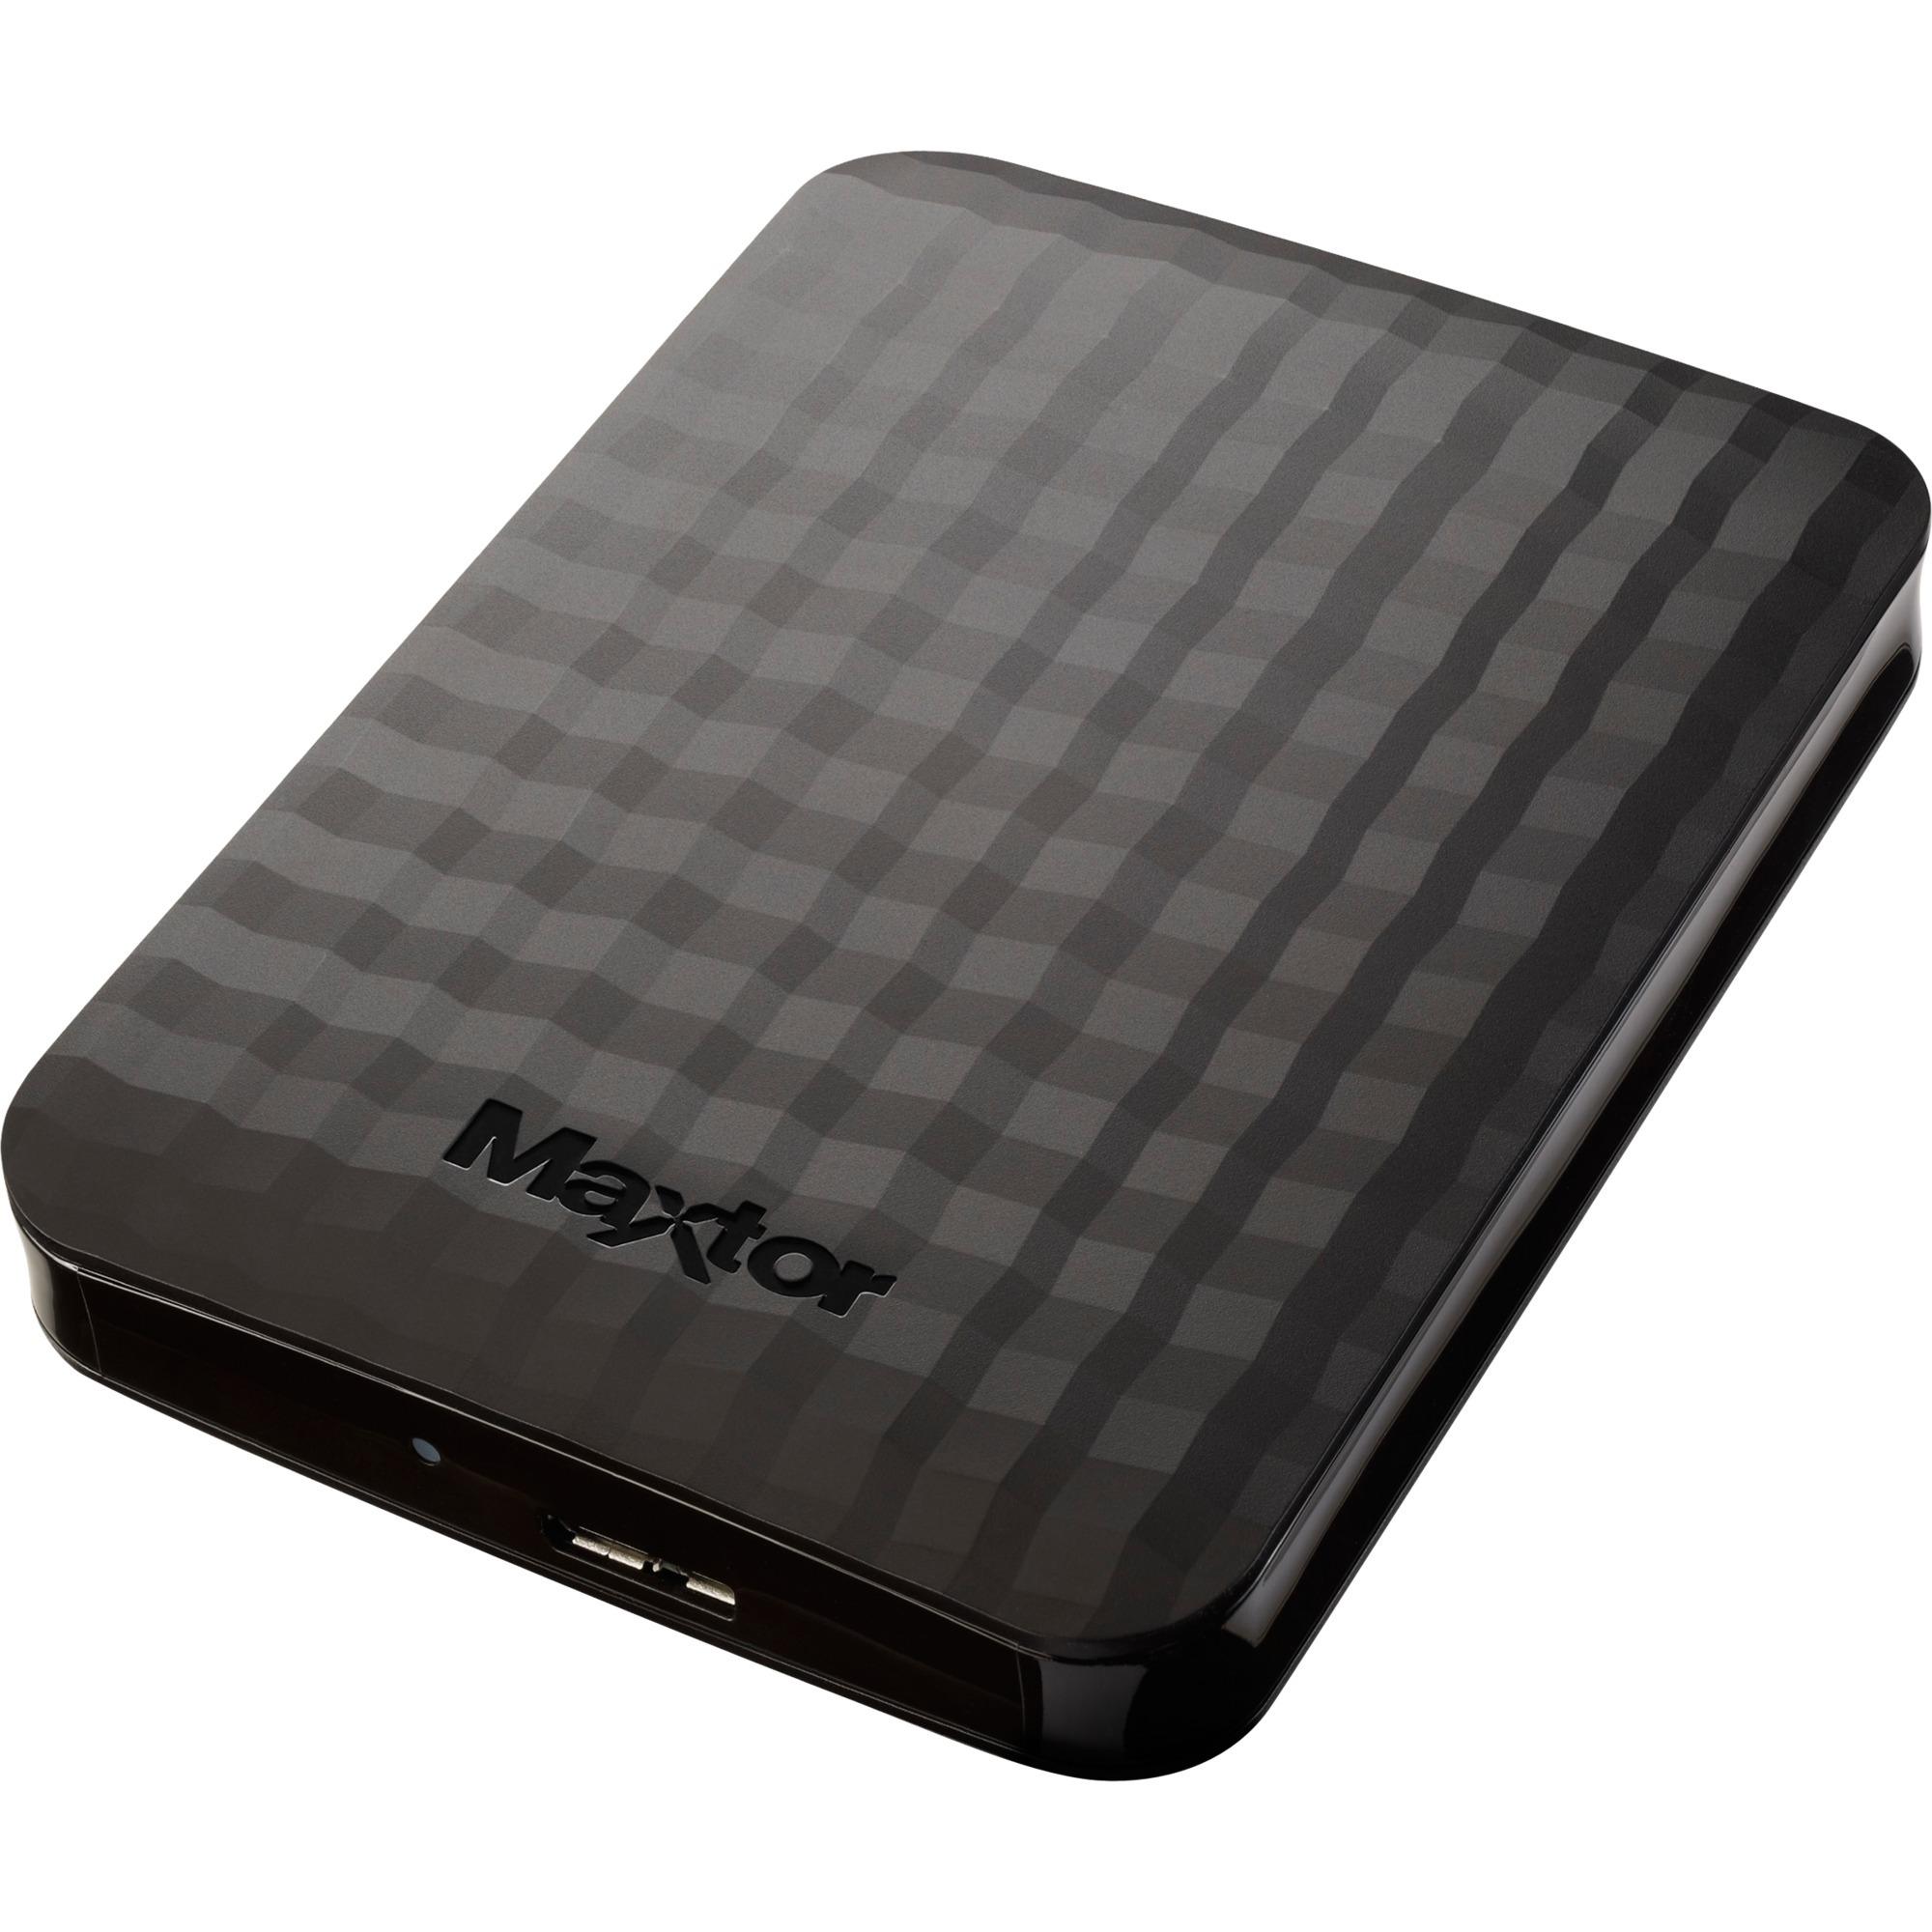 M3 2000GB Negro disco duro externo, Unidad de disco duro